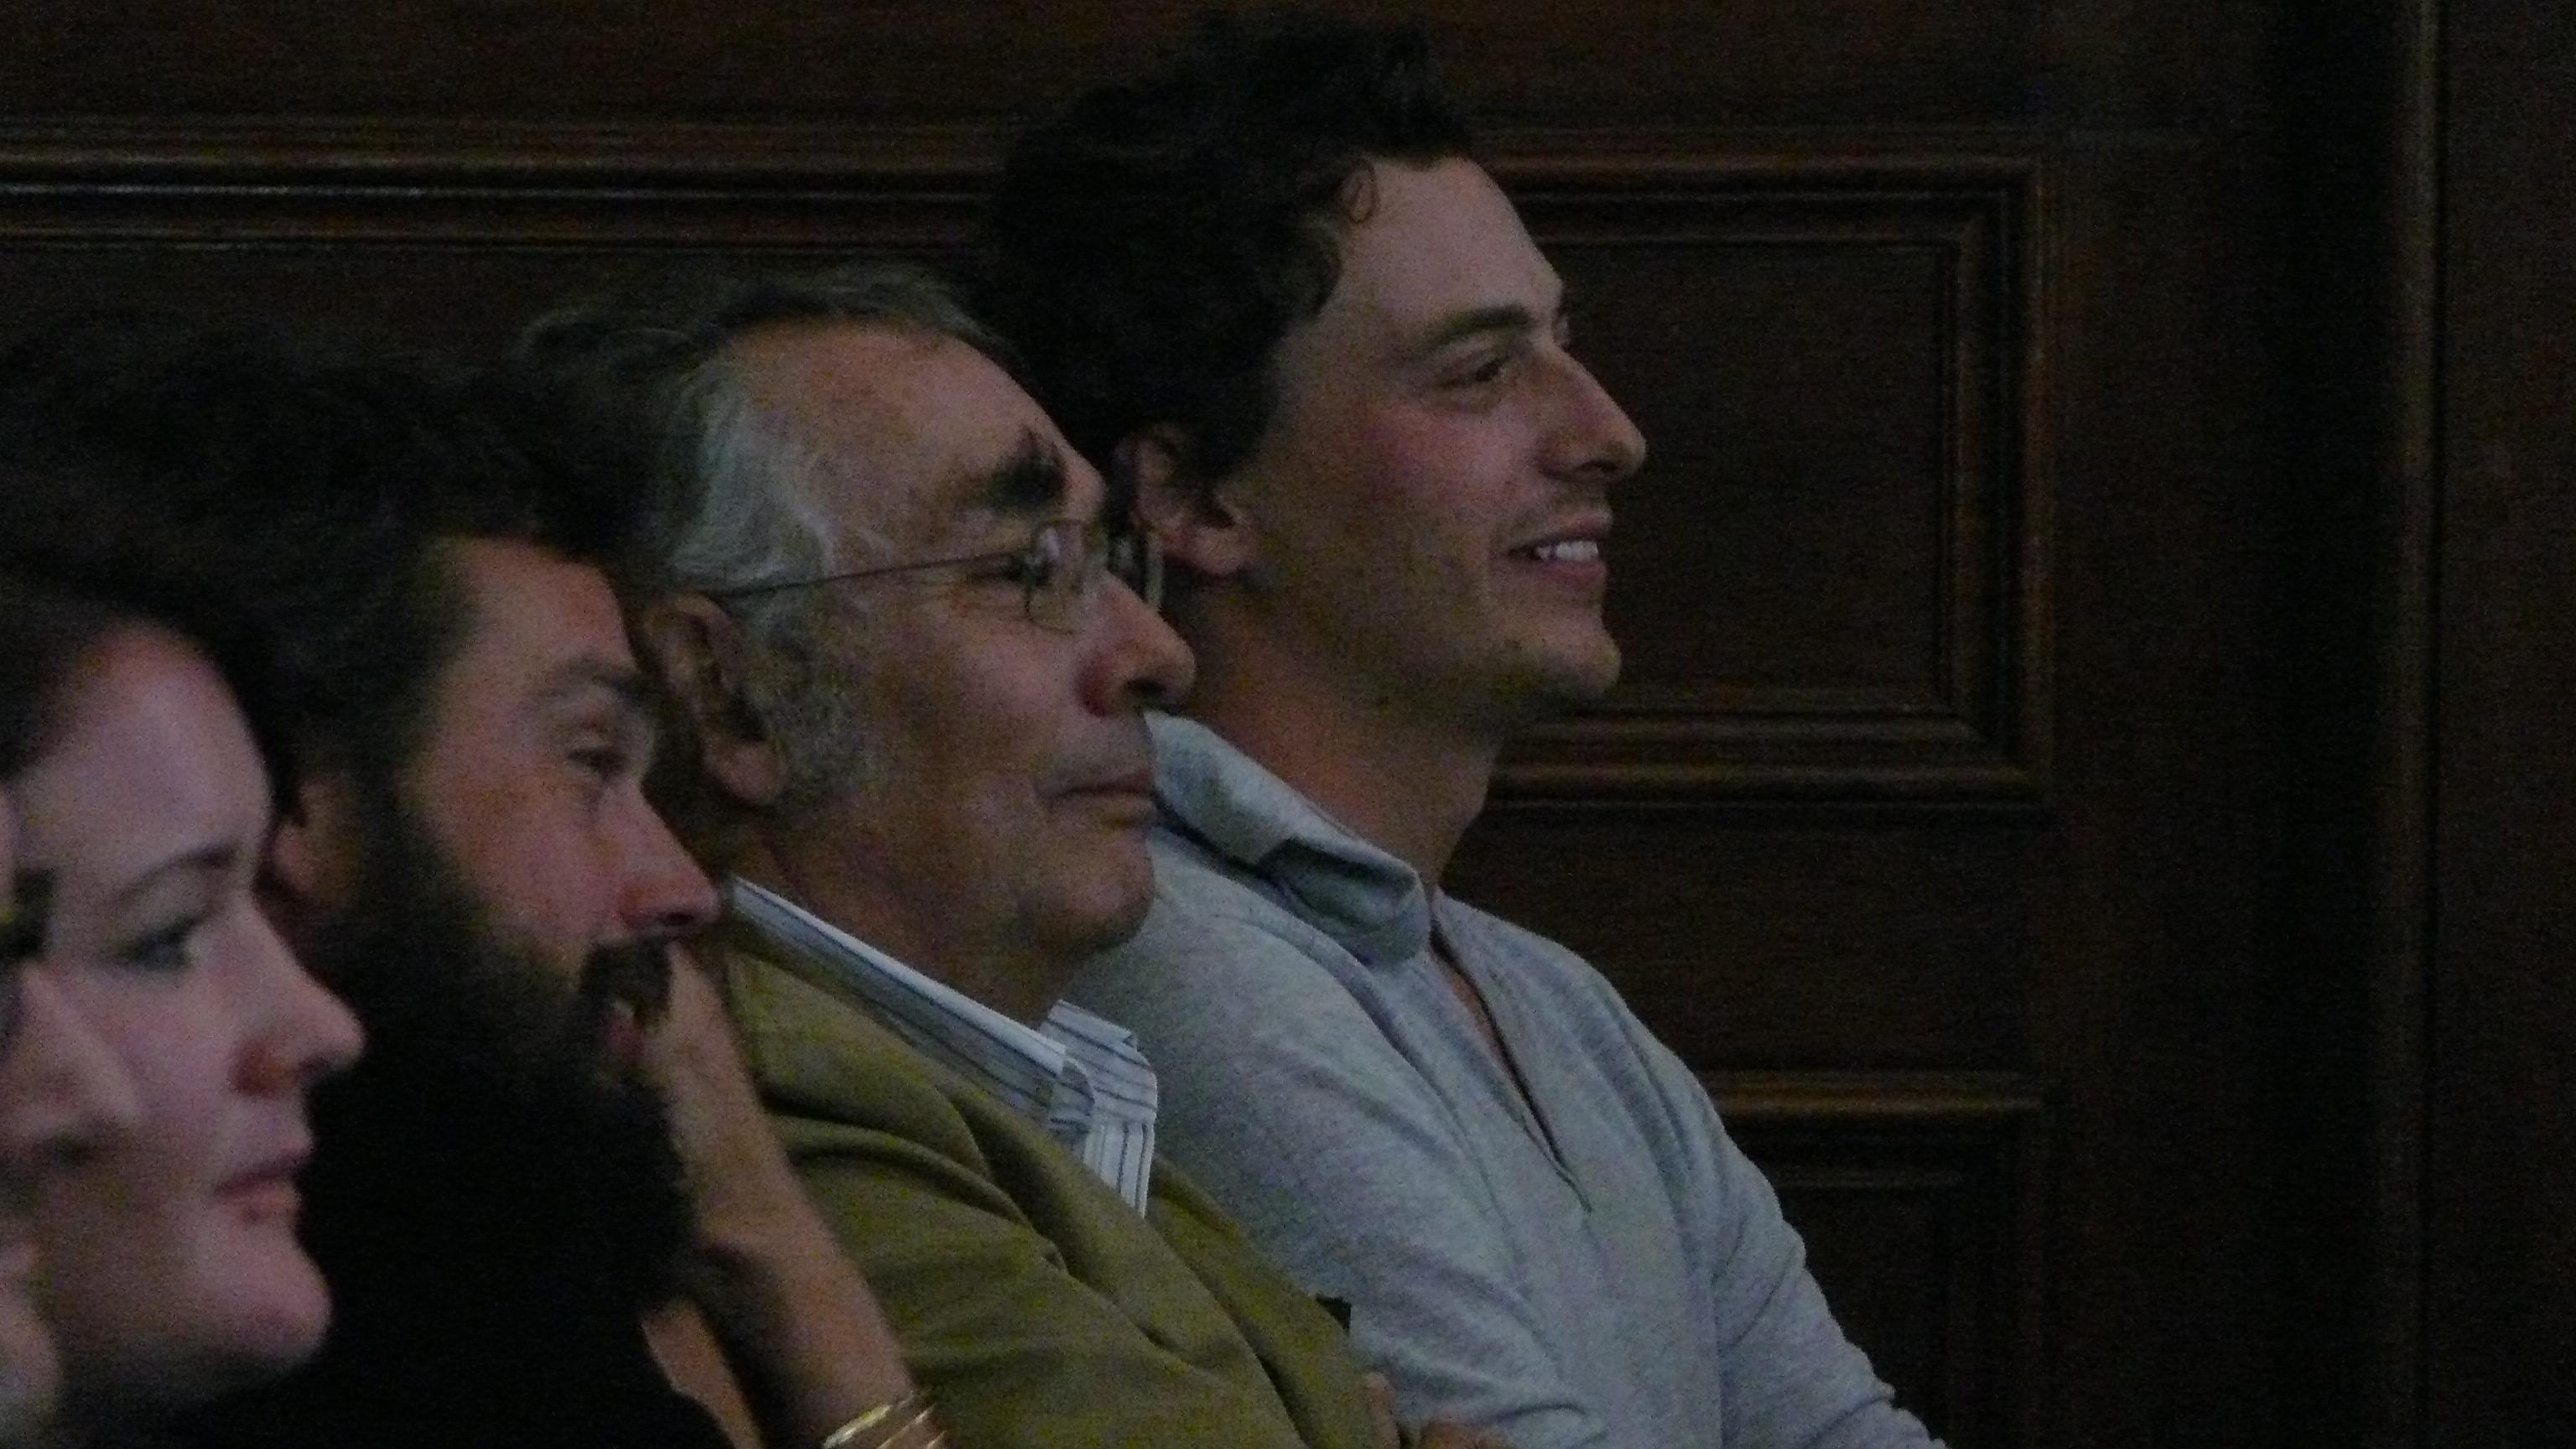 from right to left: Daniel Weisz Carrington (grandson) and Gabriel Weisz Carrington (Son)